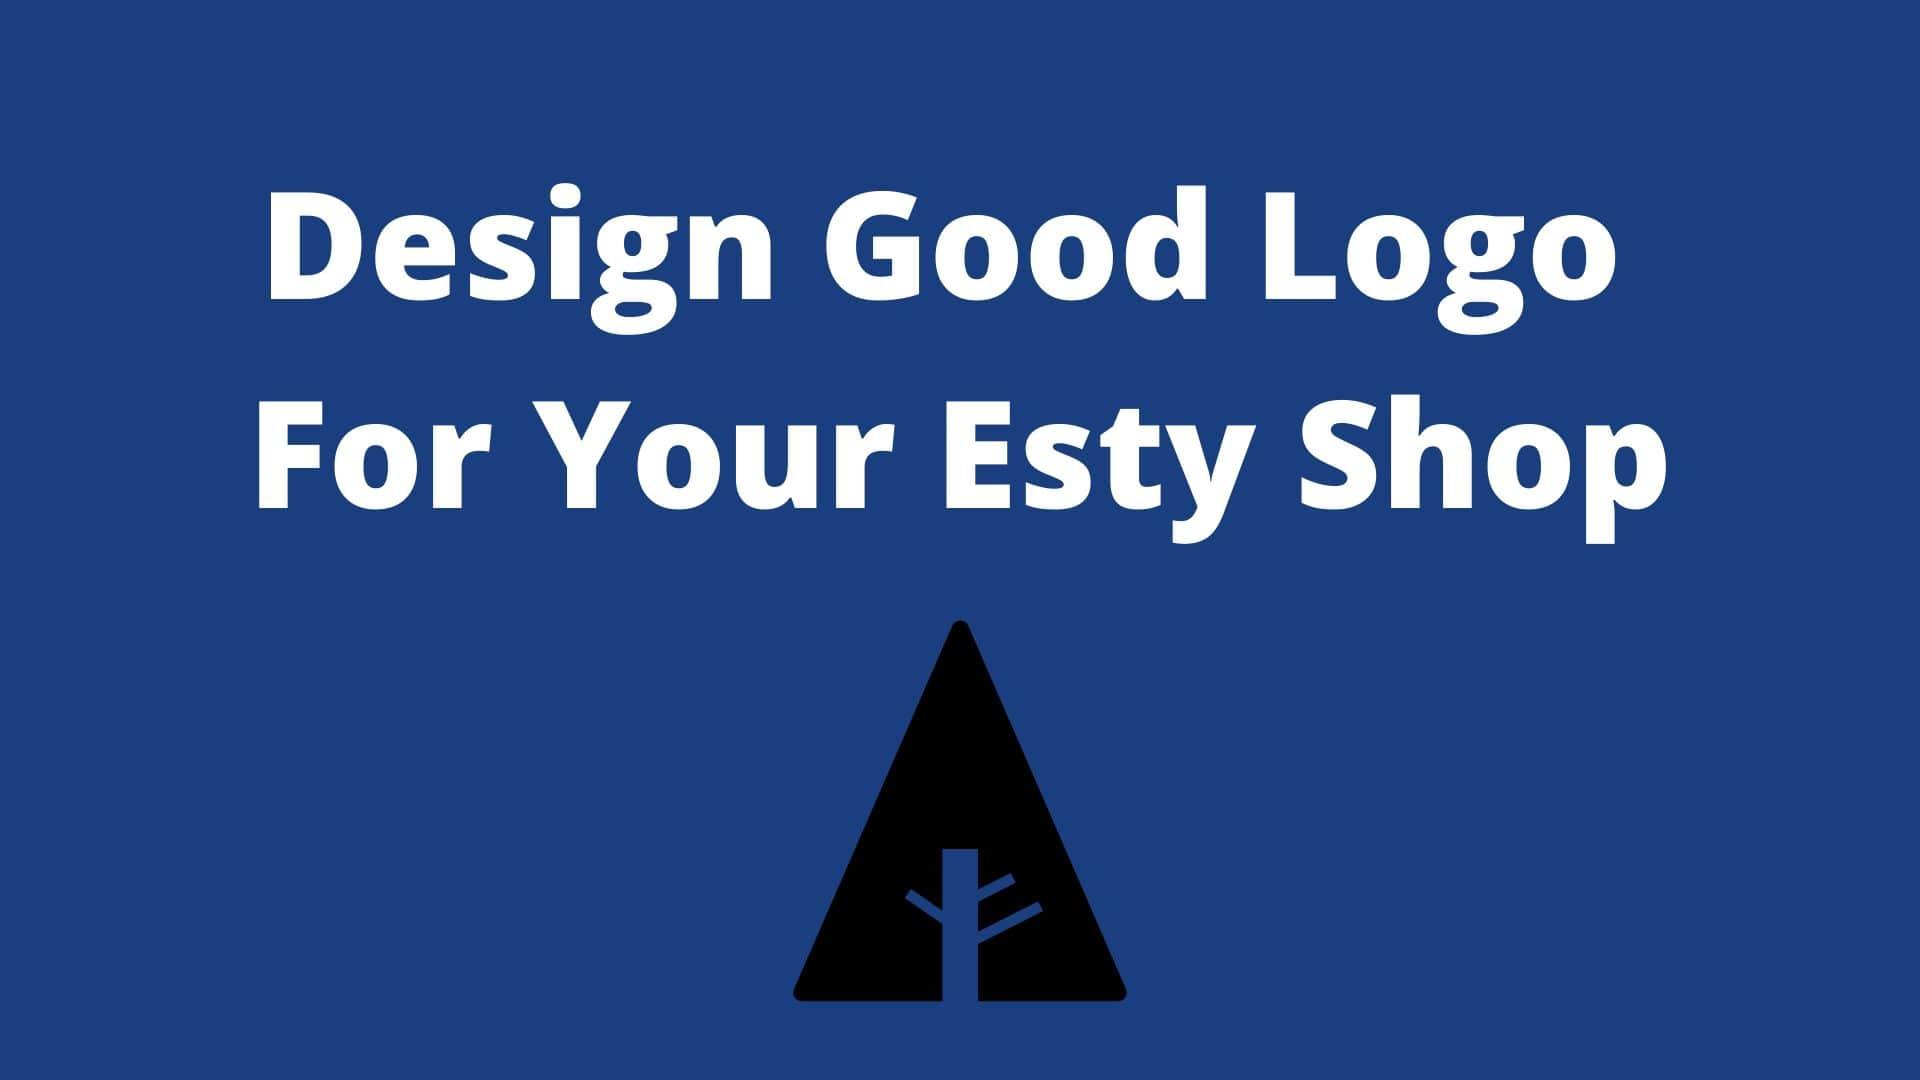 Get Good logo For Your Etsy Shop